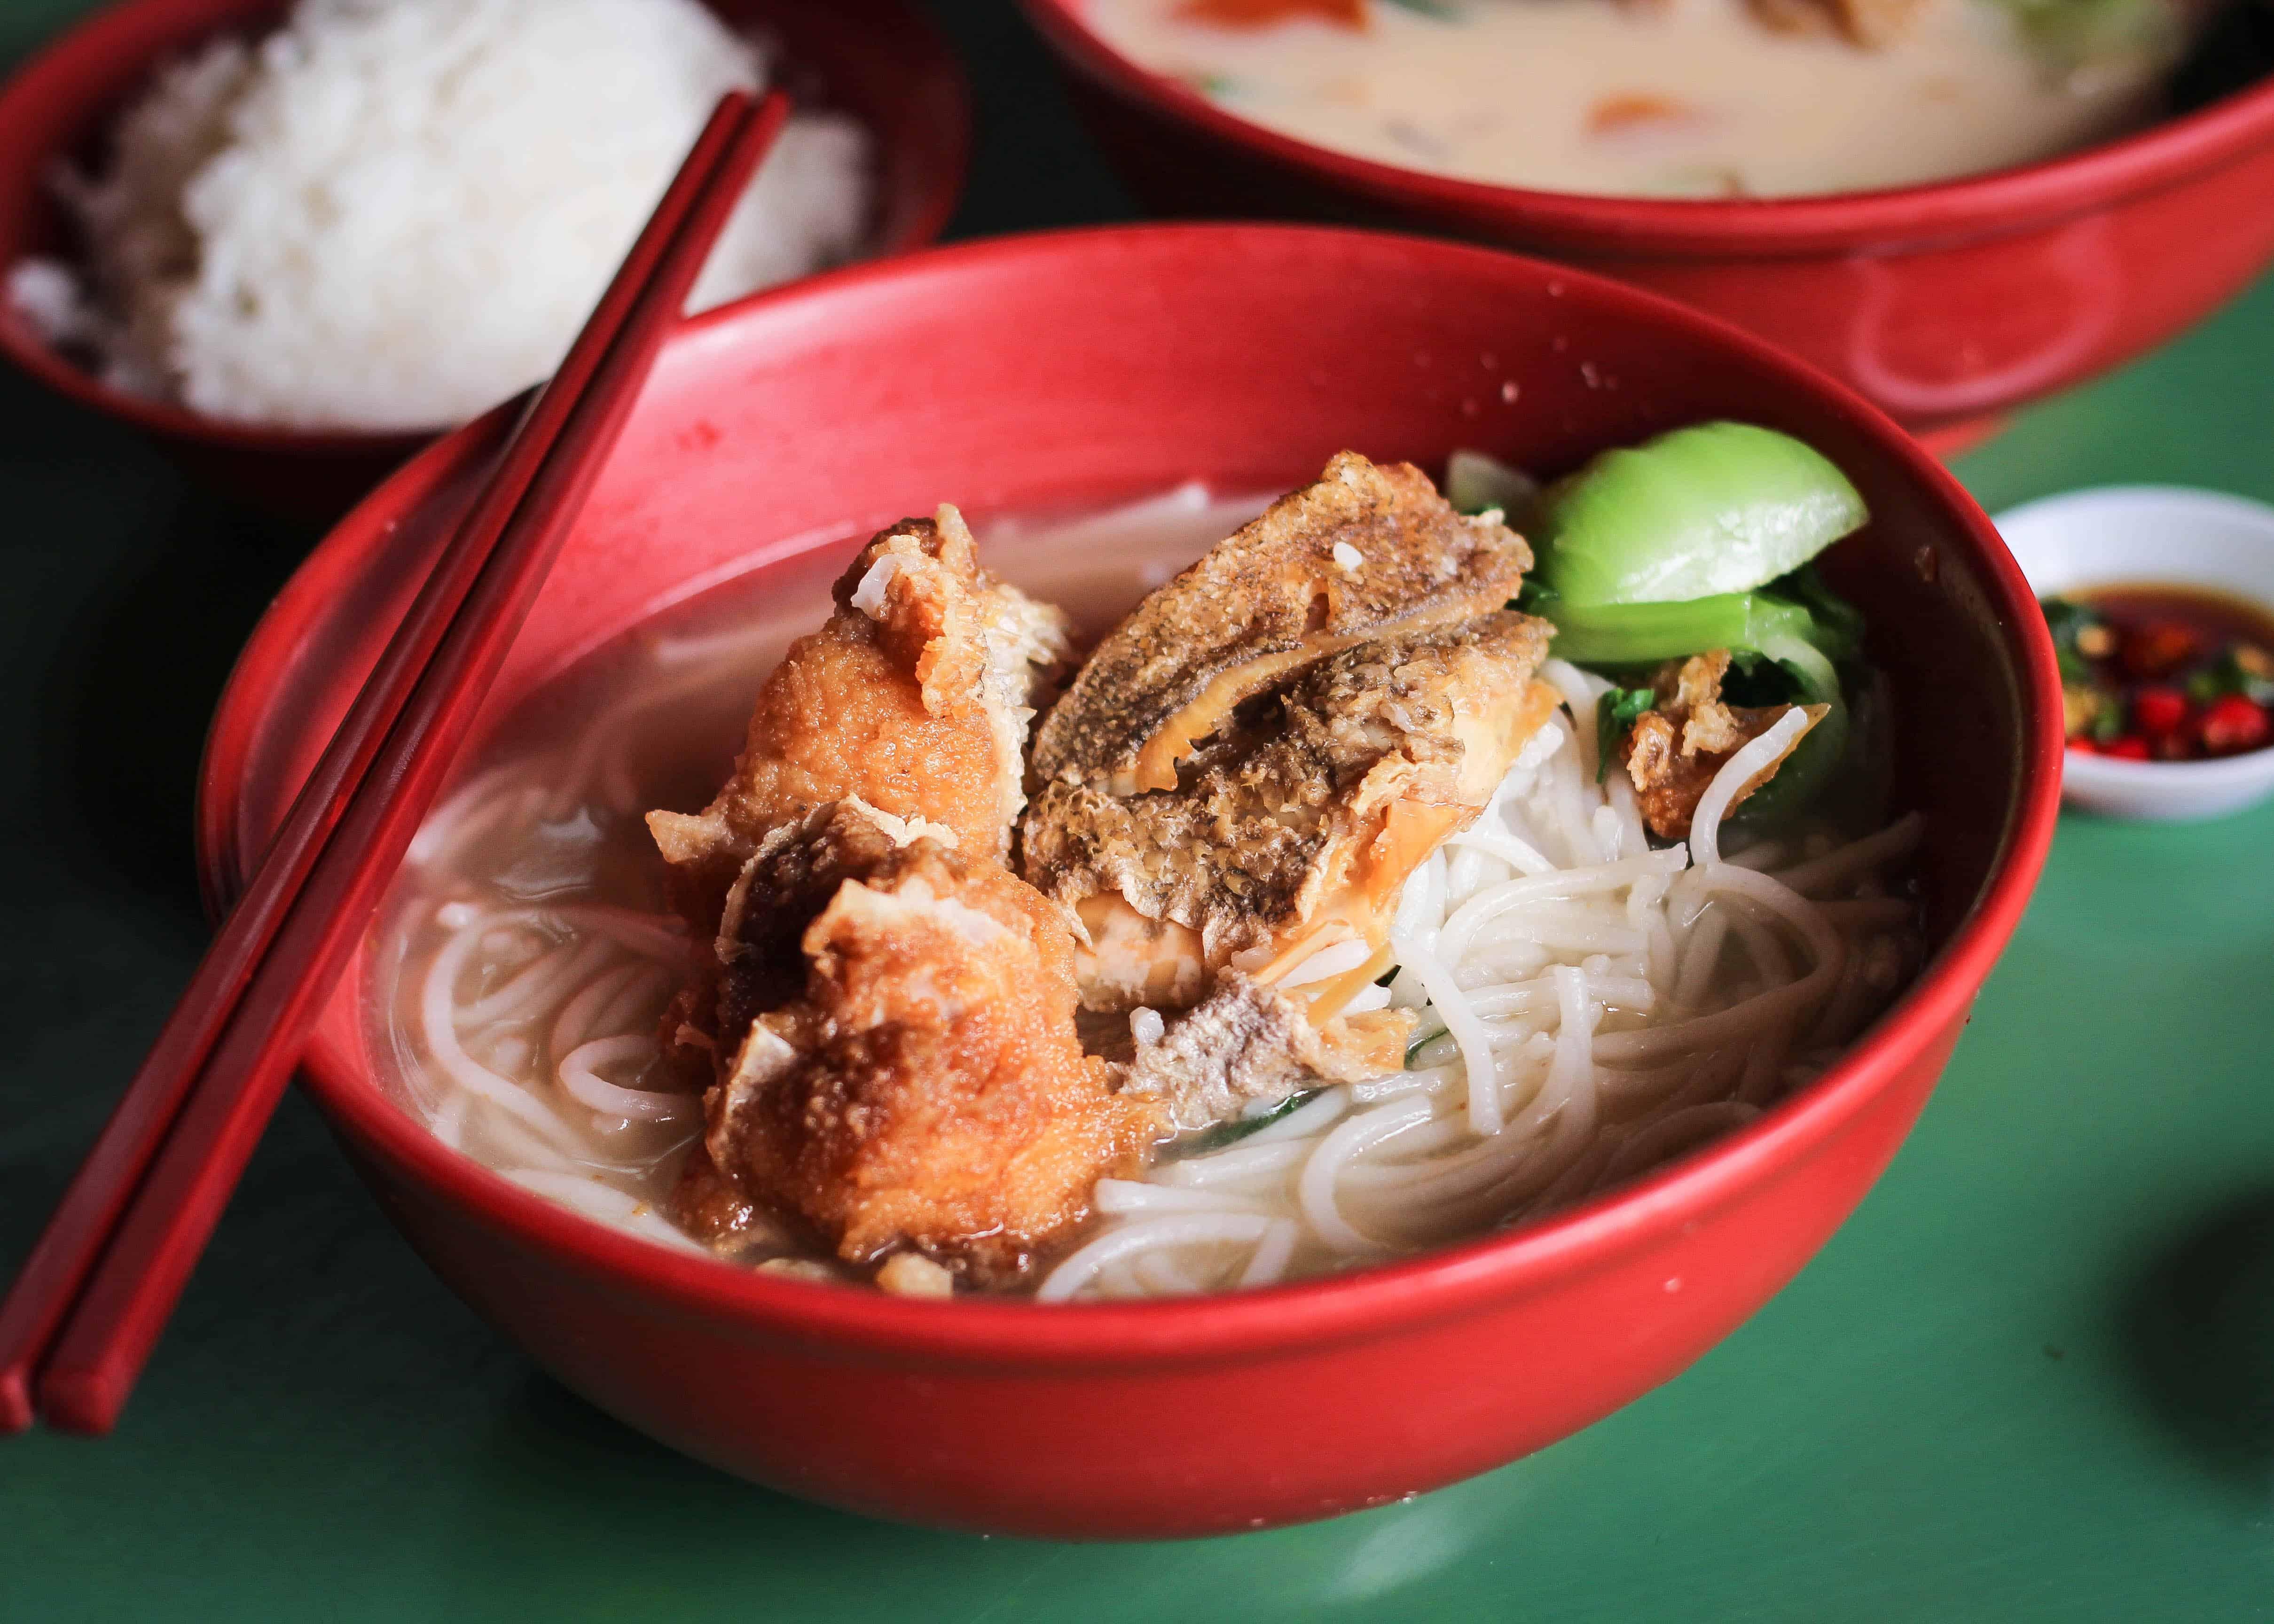 Jin Hua Fish Soup Cantonese Fish Soup At Maxwell Food Centre Miss Tam Chiak